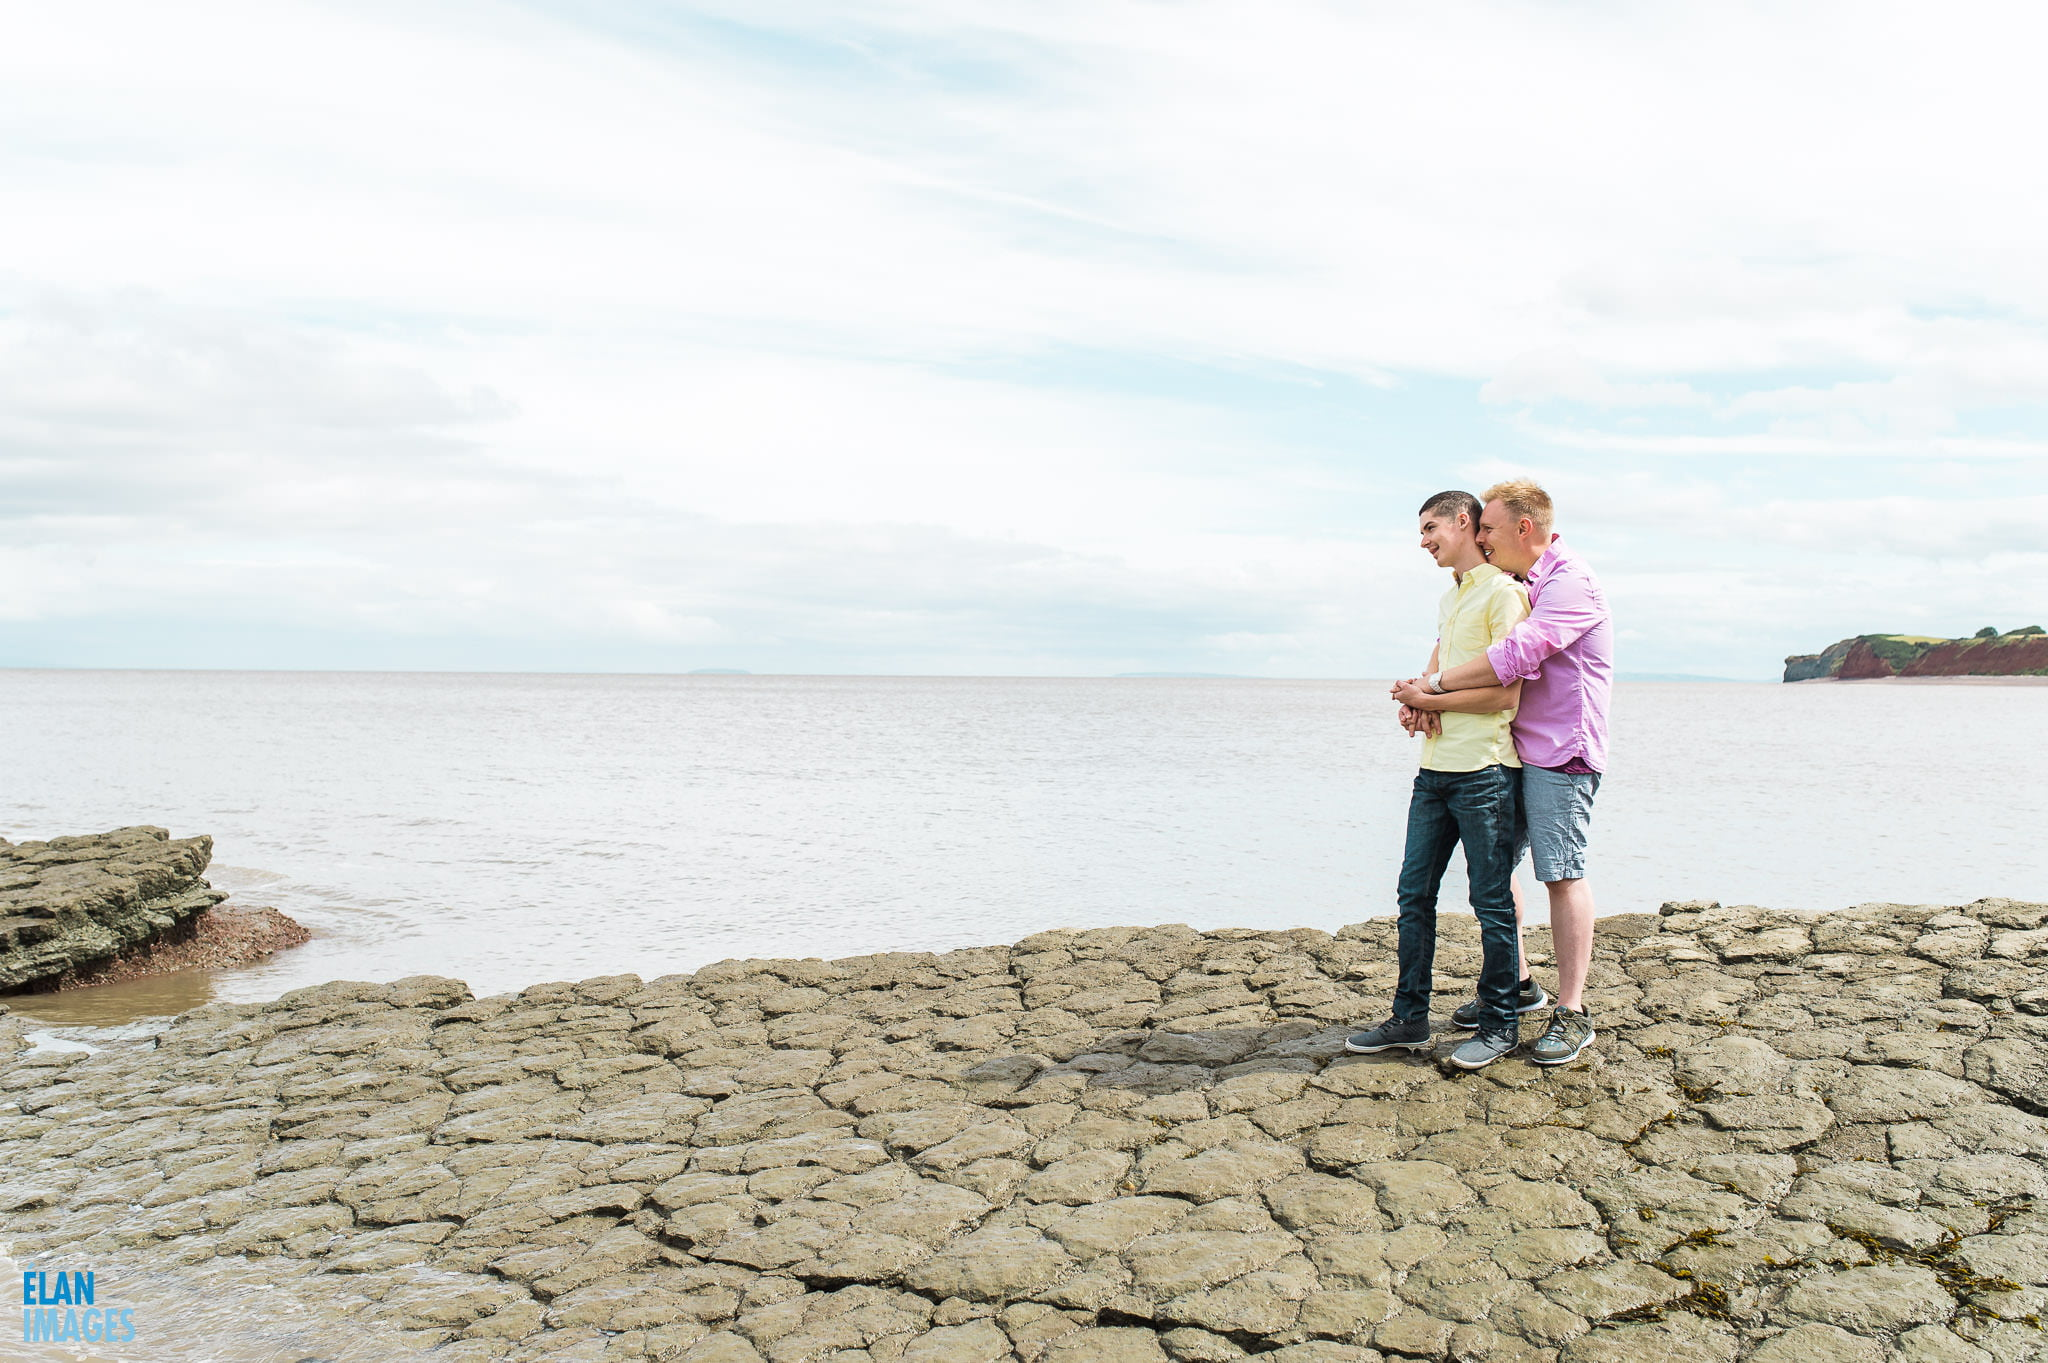 Engagement photo shoot at St Audrie's Bay, Devon 25